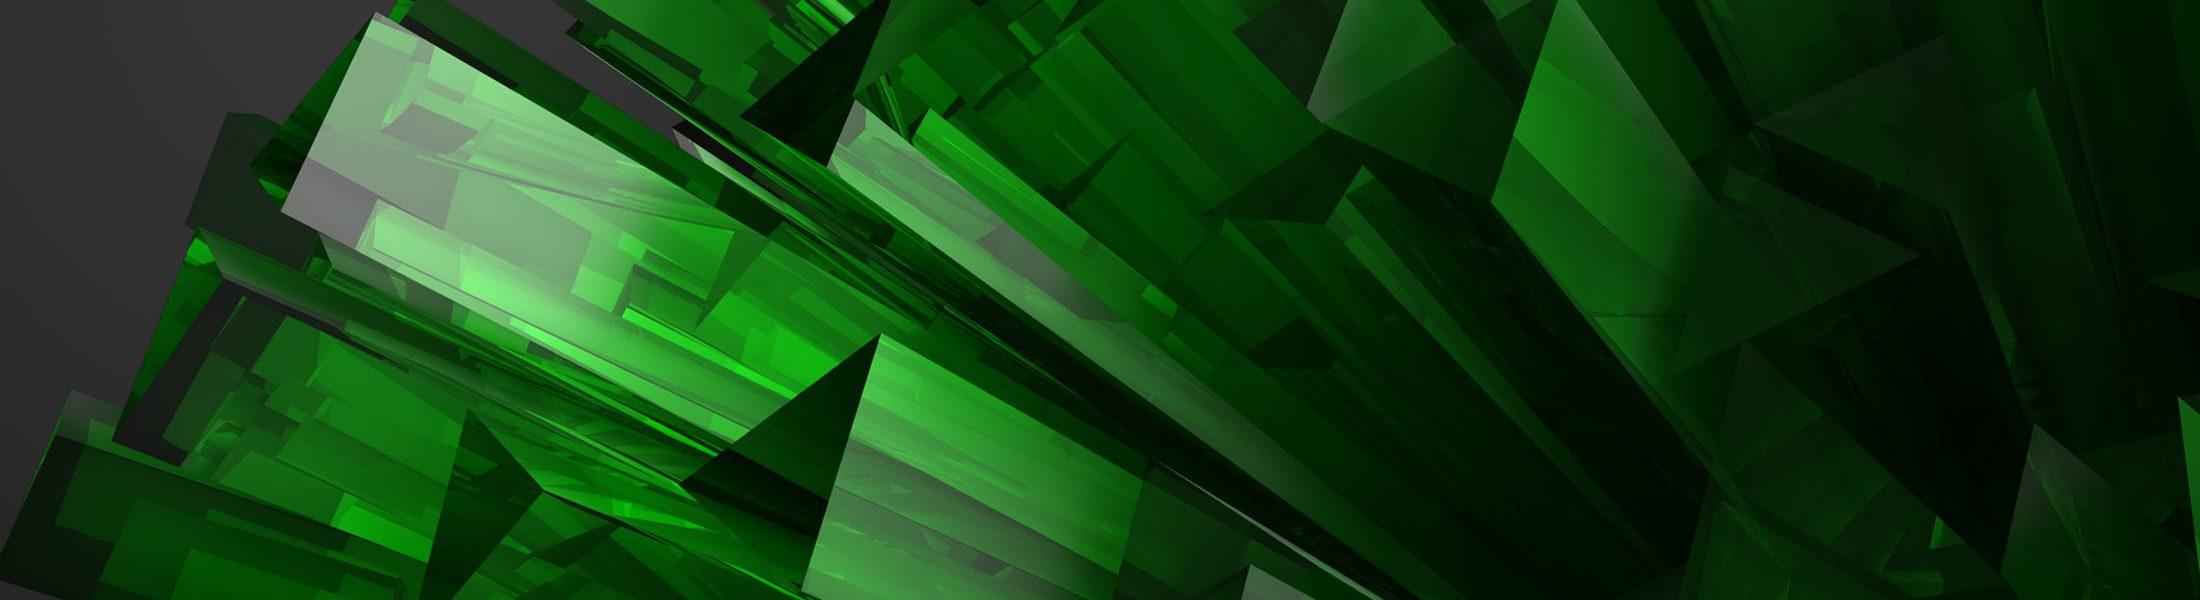 Kristallform in 3D gerendert mit Details